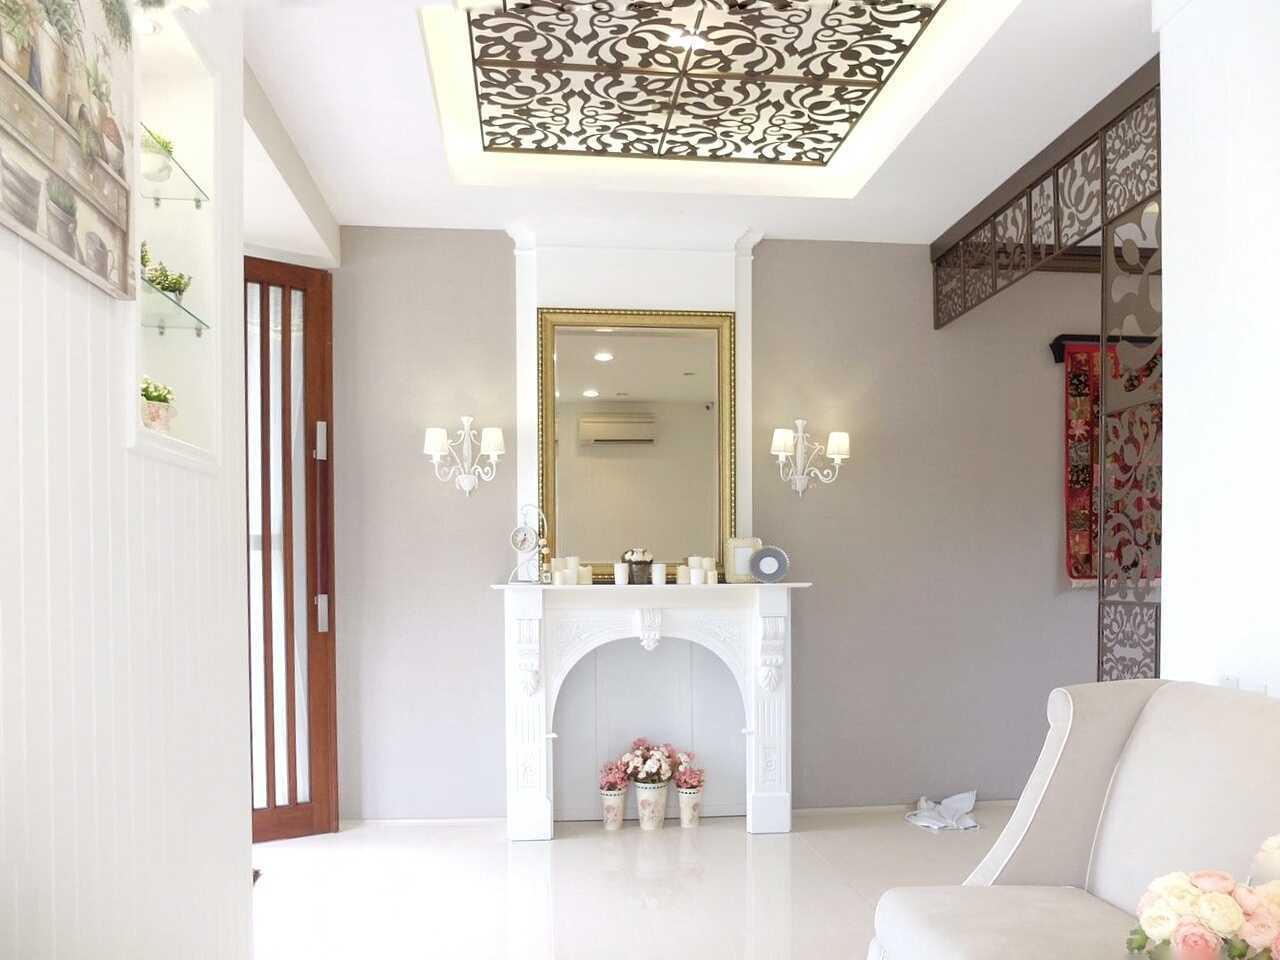 7Design Architect Mrs. D House Citrasun, Yogjakarta Citrasun, Yogjakarta Foyer Klasik 18703